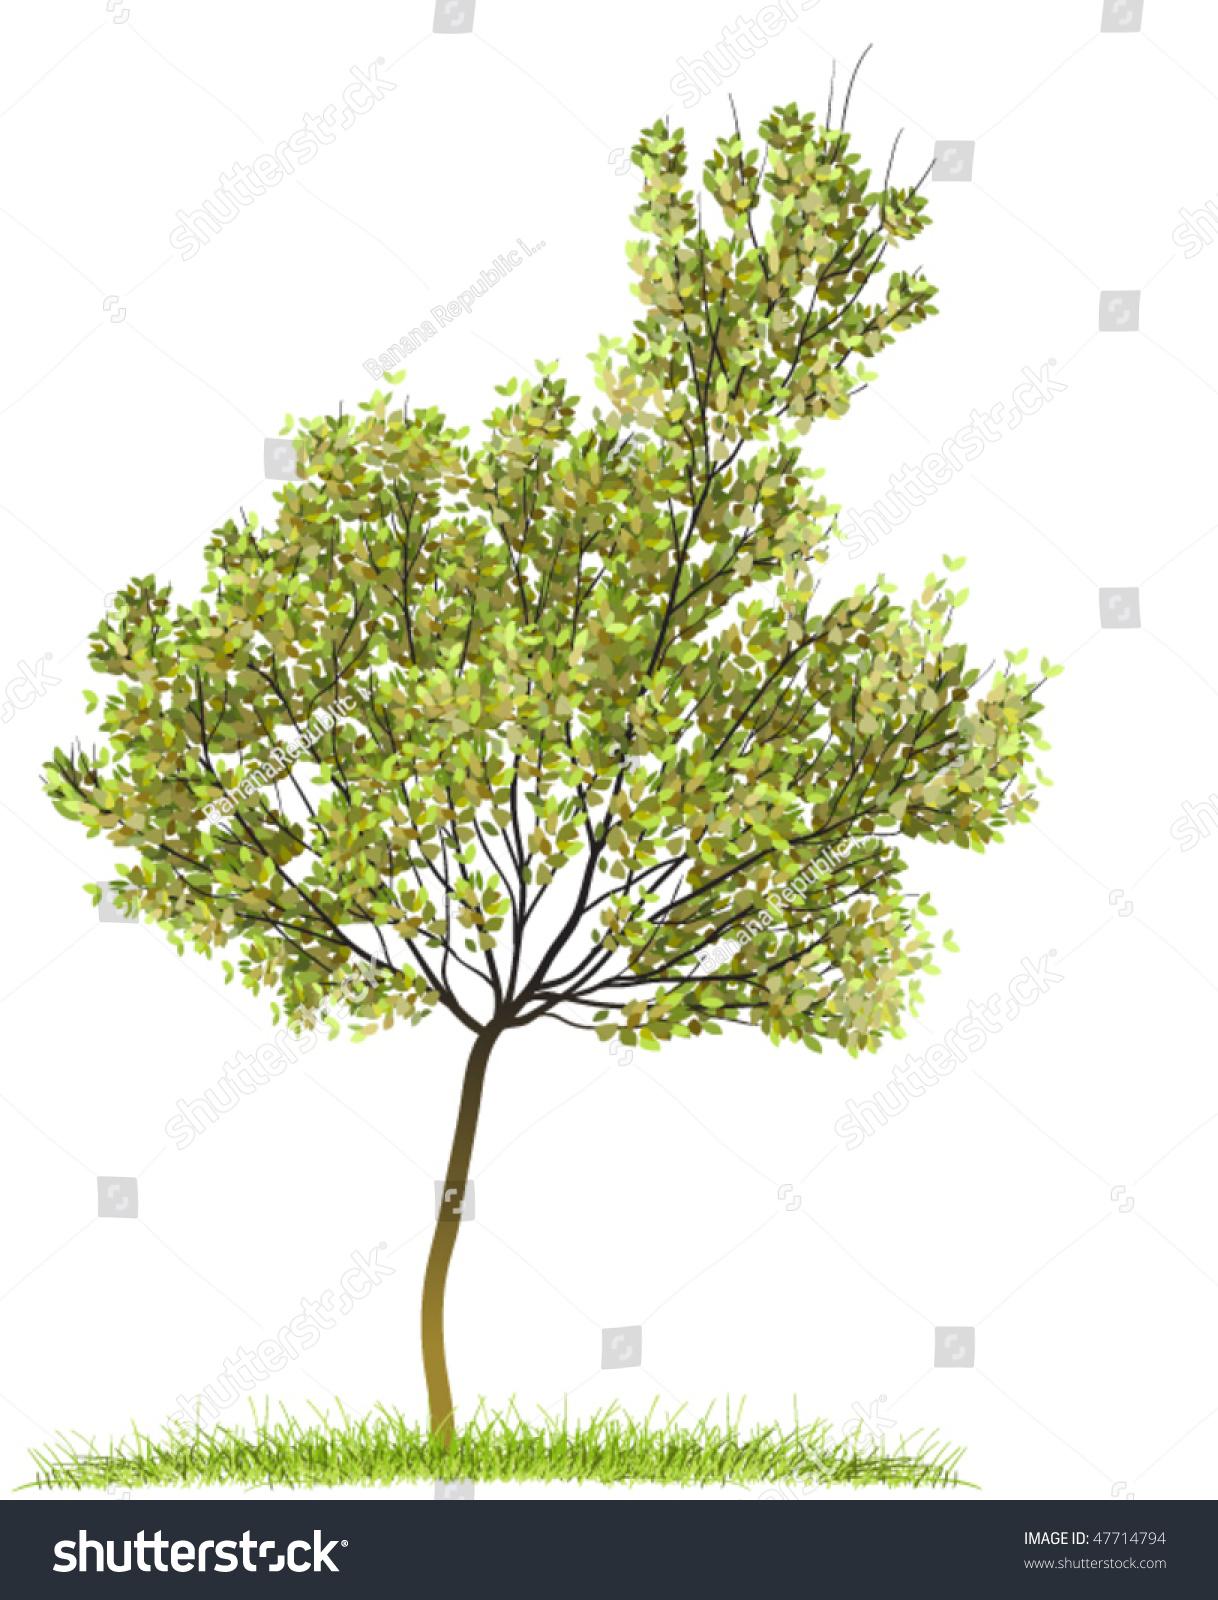 nature spring green tree - photo #36